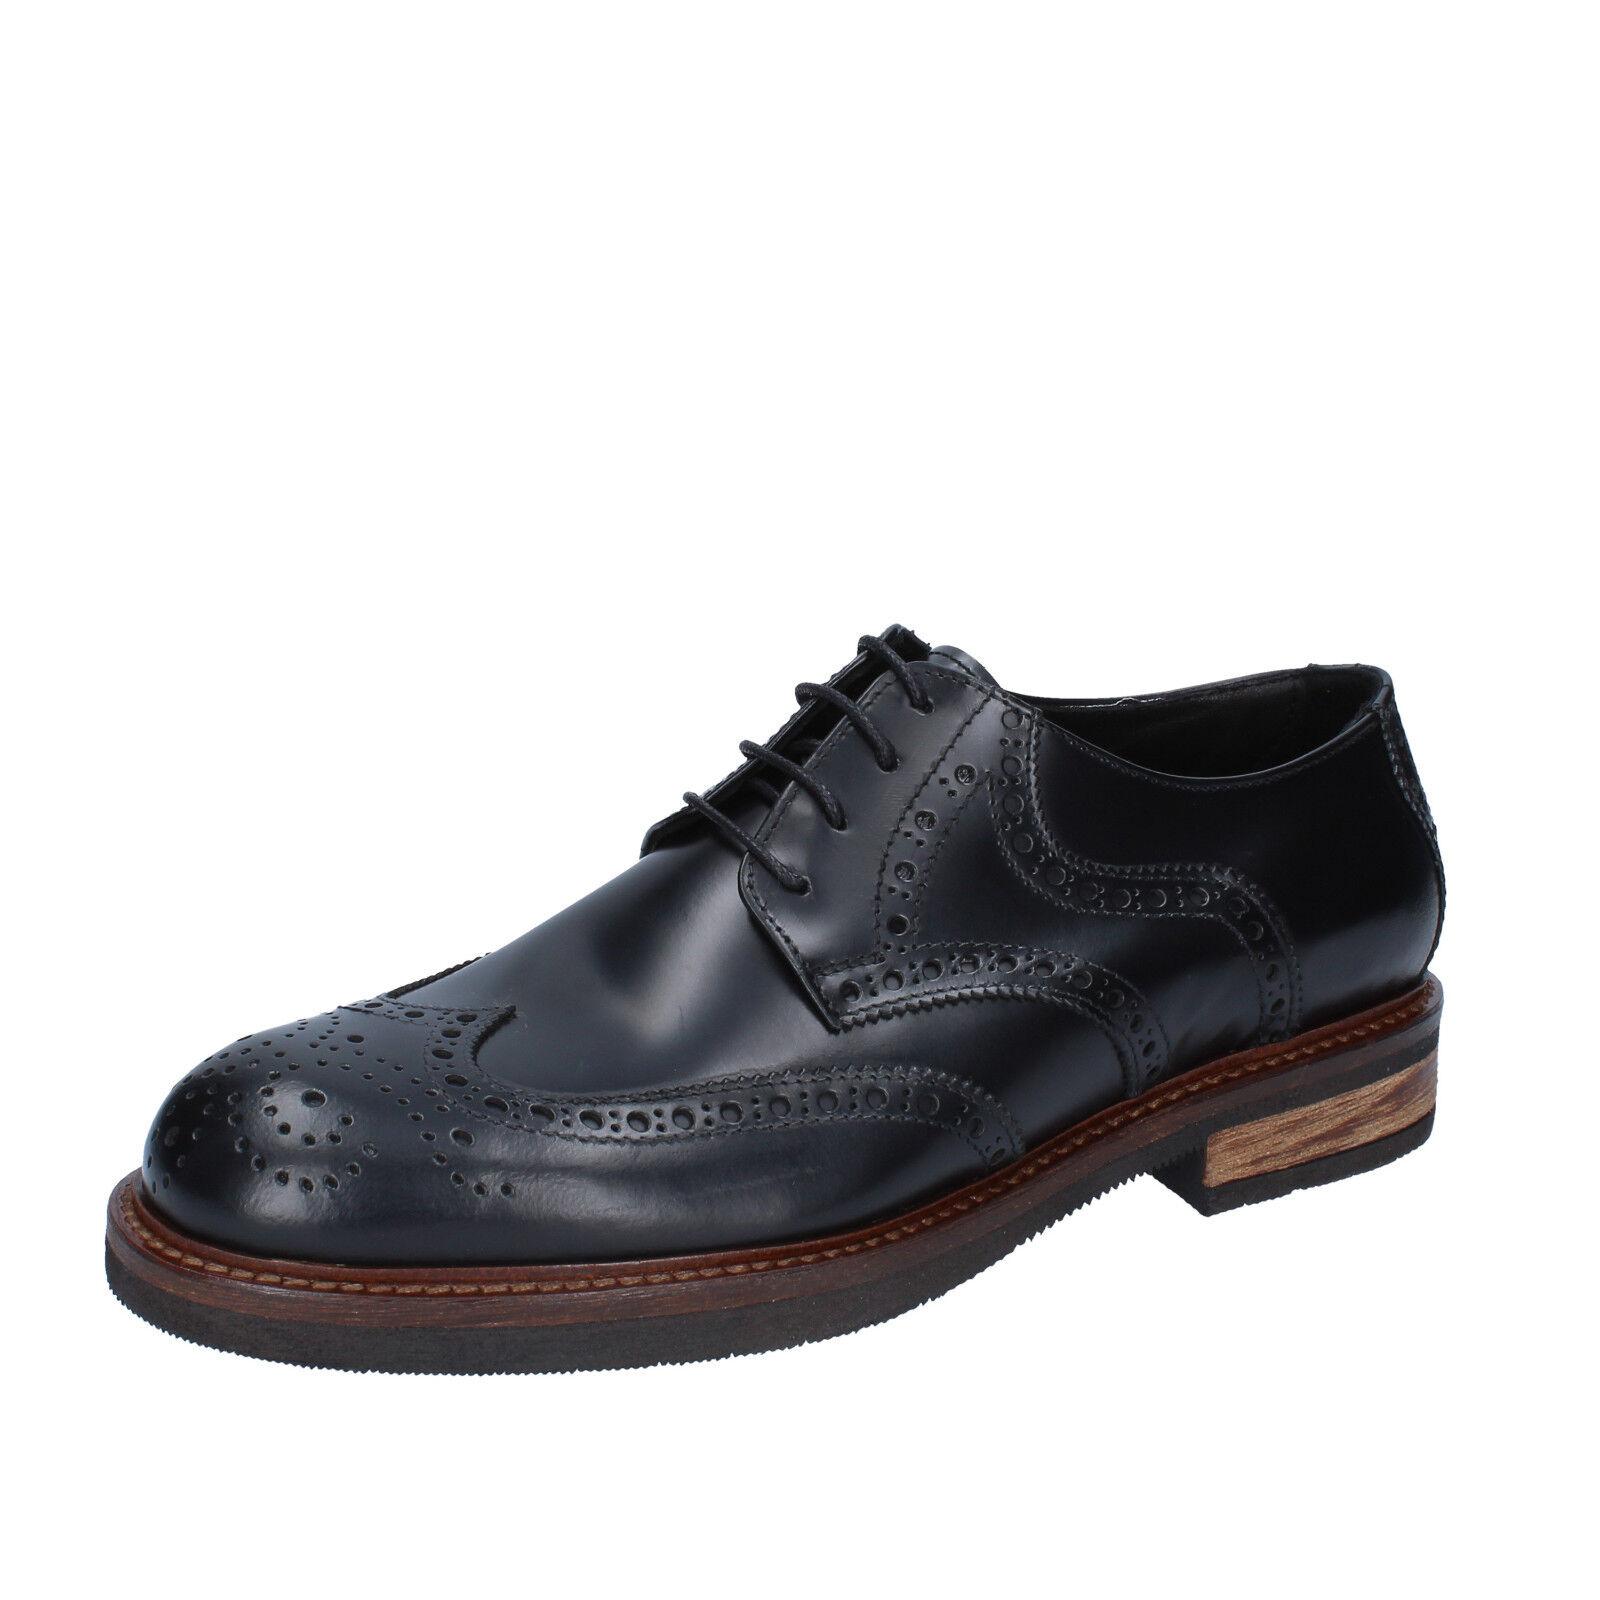 Men's shoes FDF SHOES 11 (EU 44) elegant black shiny leather BZ338-44